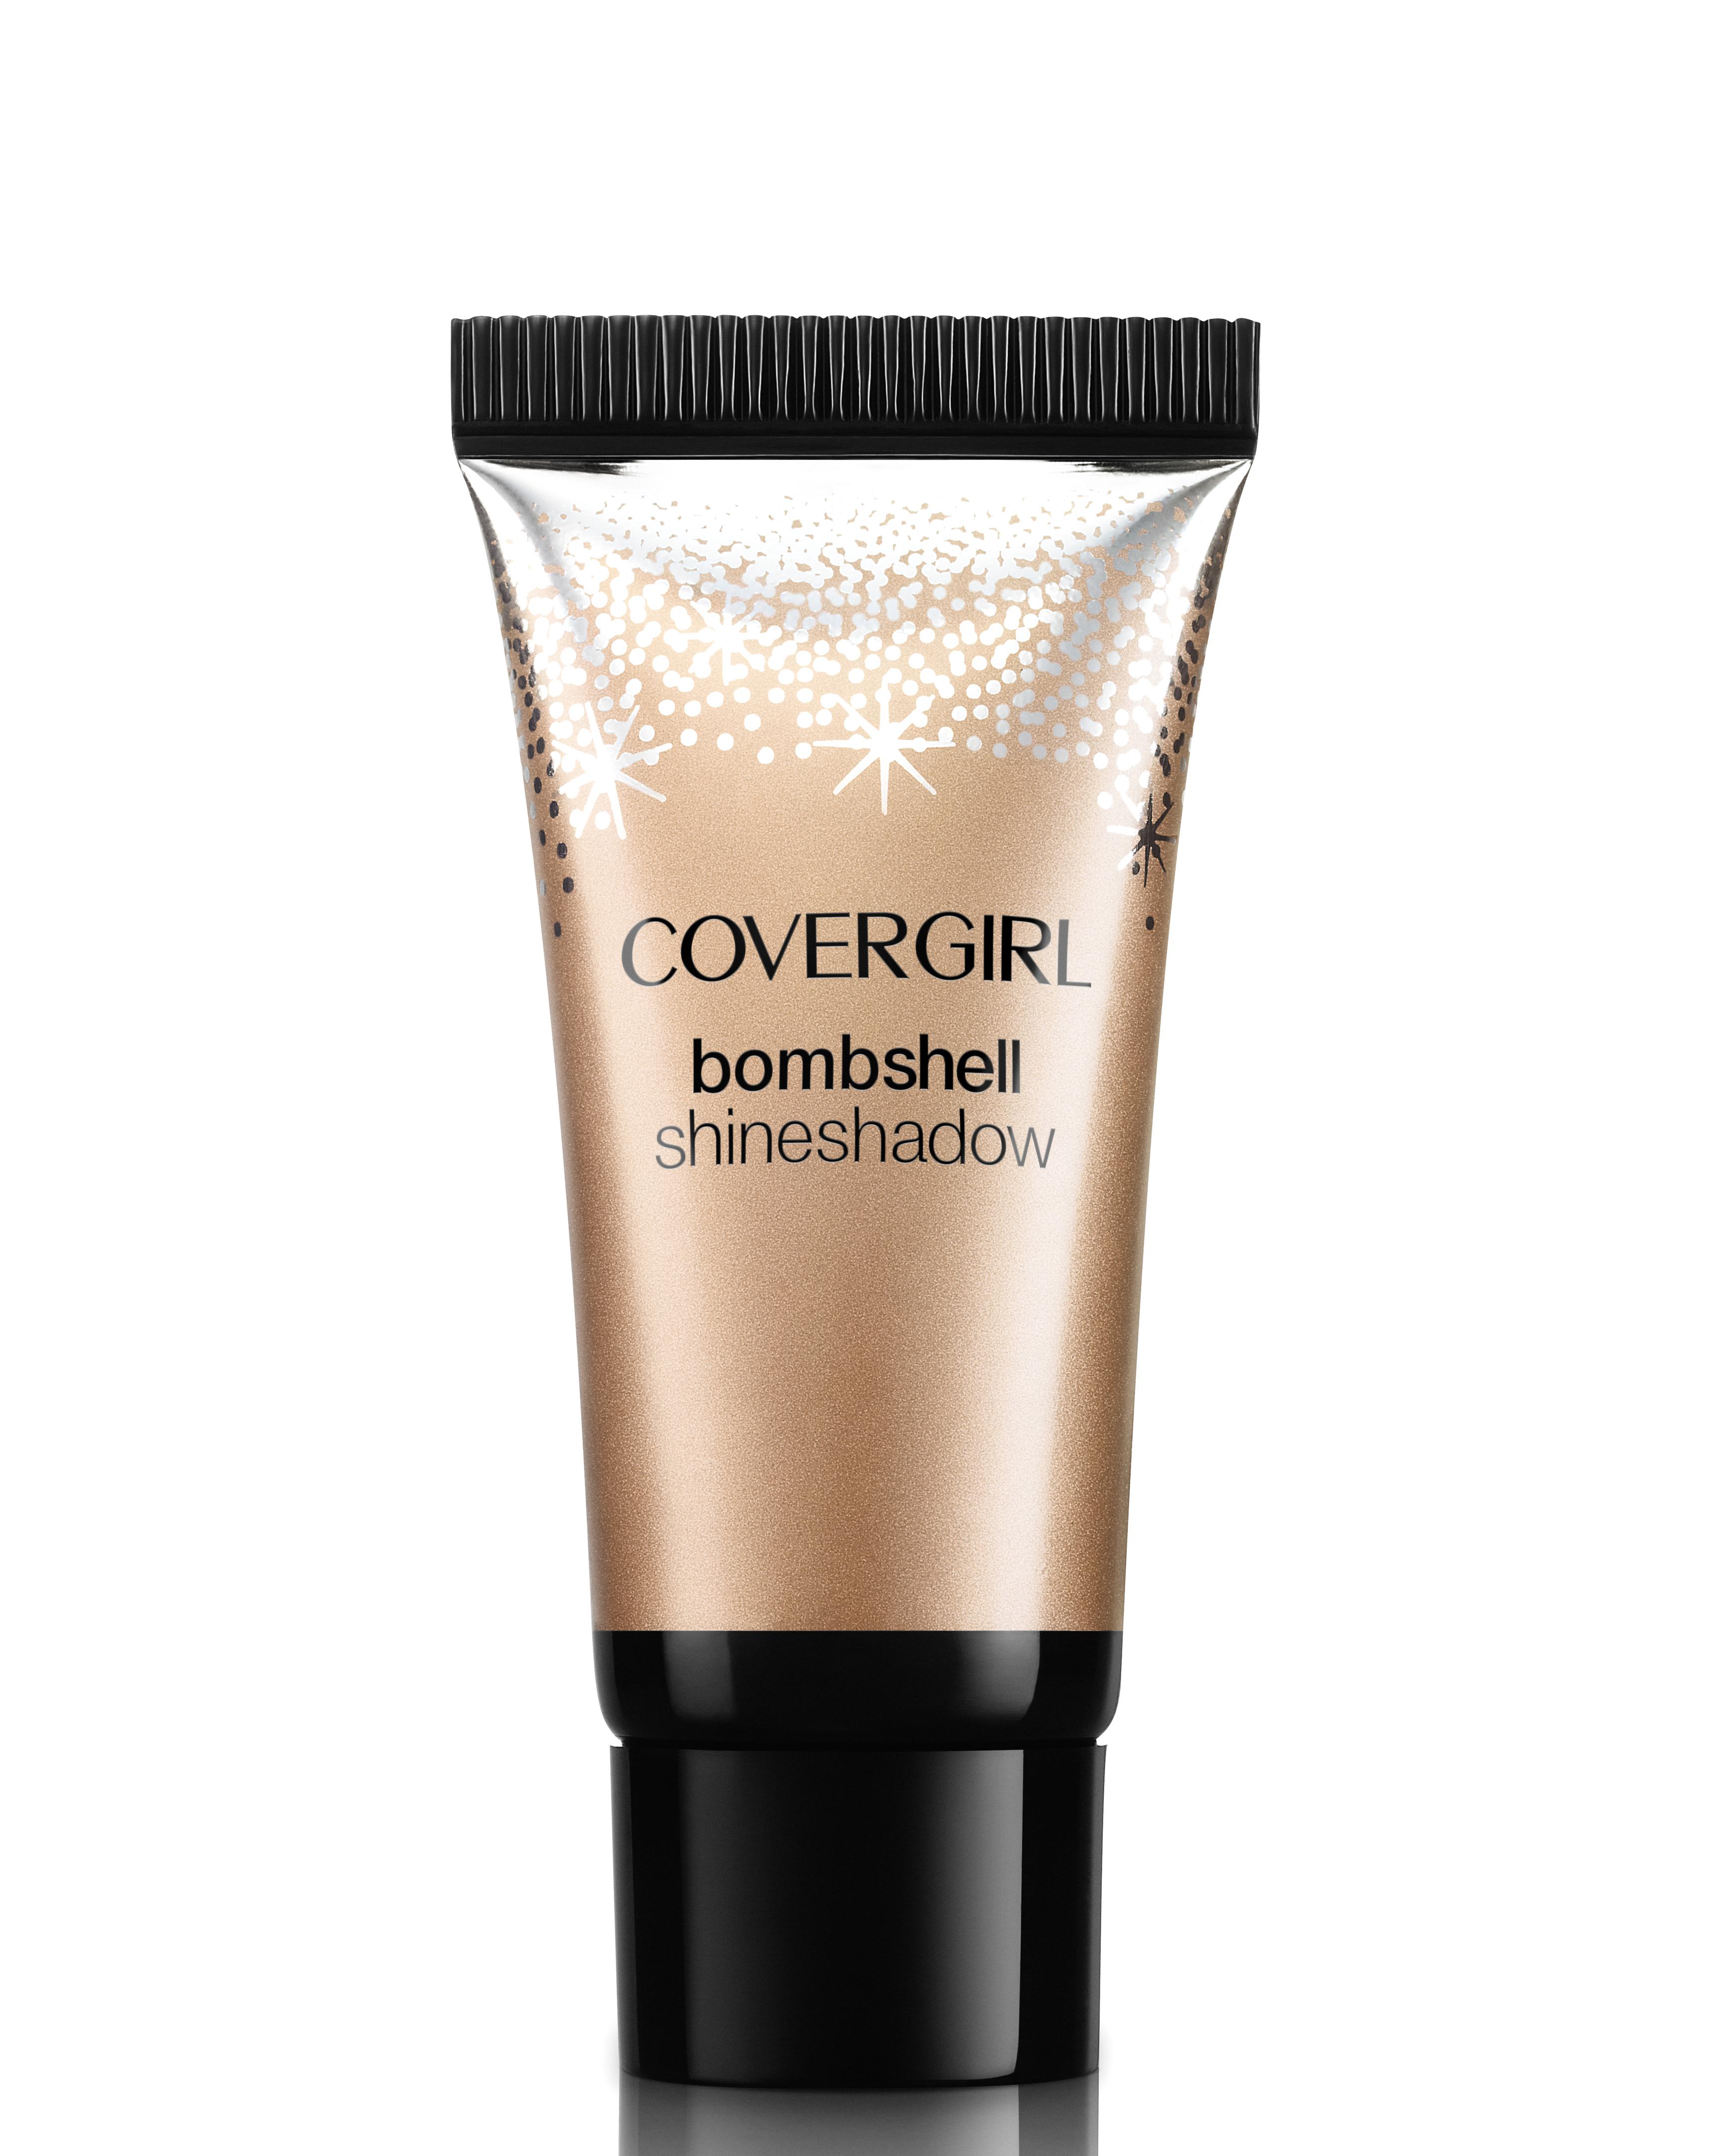 skin-glow-covergirl-bombshell-shineshadow-0815.jpg